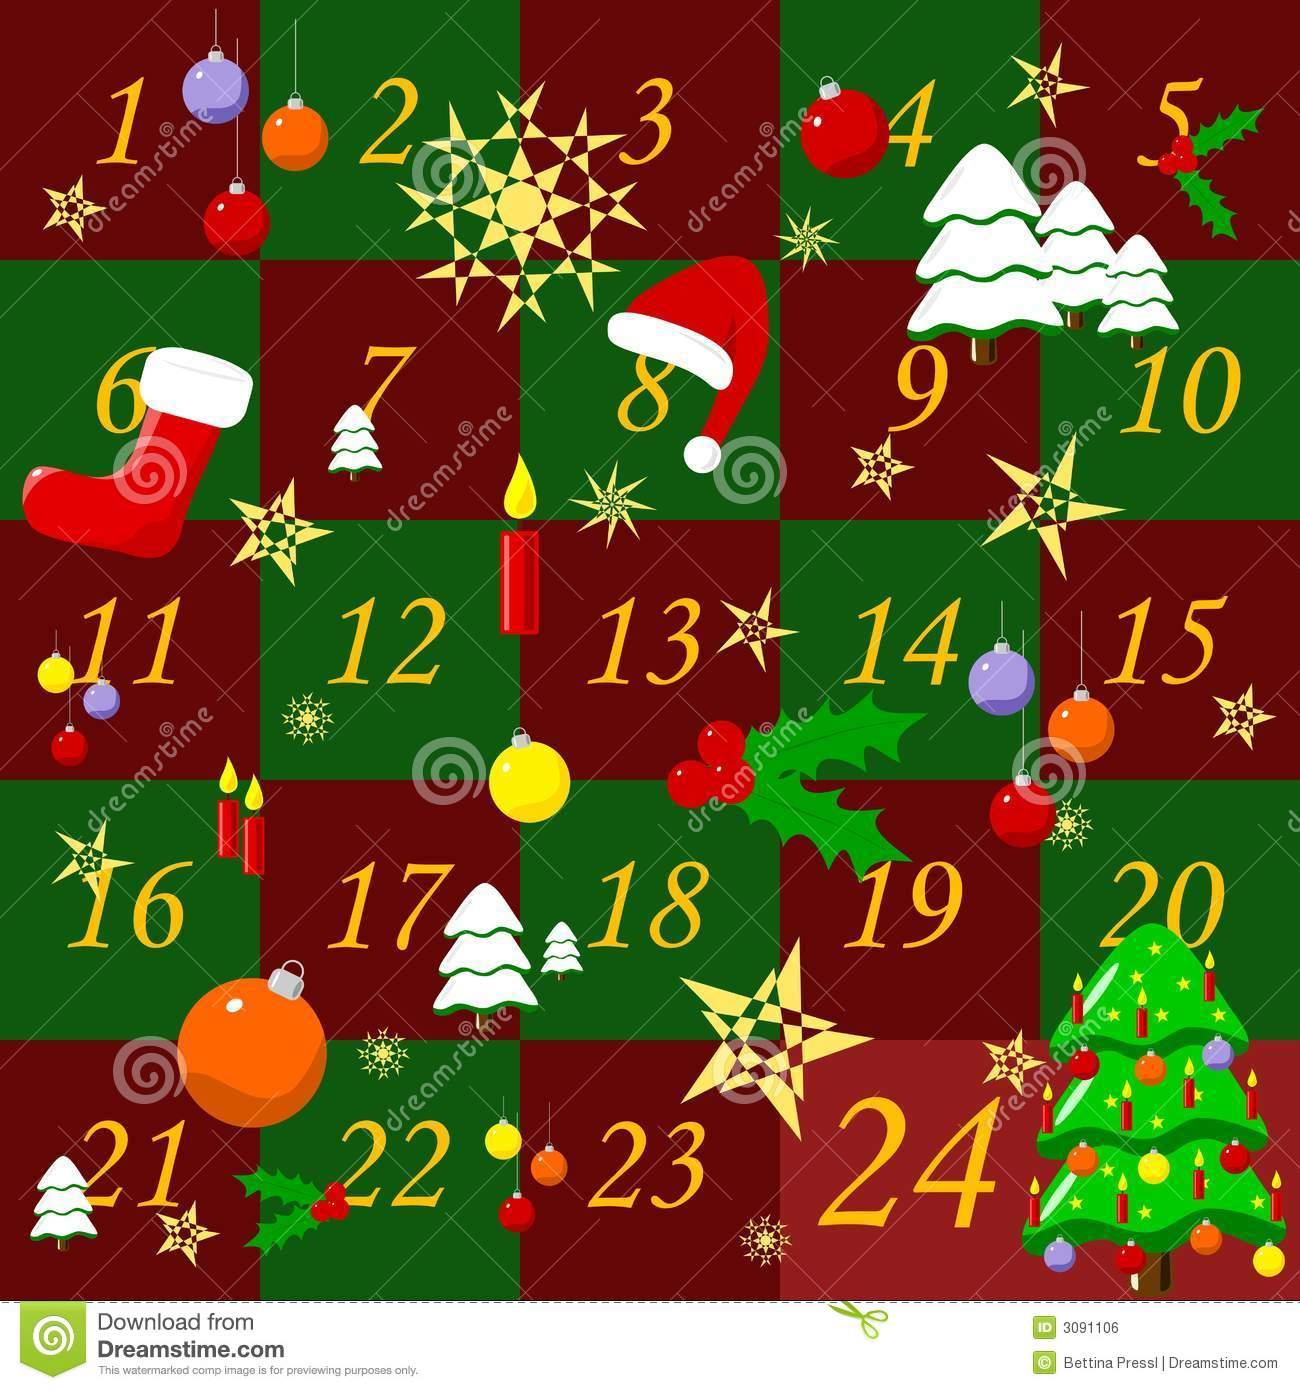 Free Christmas Advent Calendar Clipart.